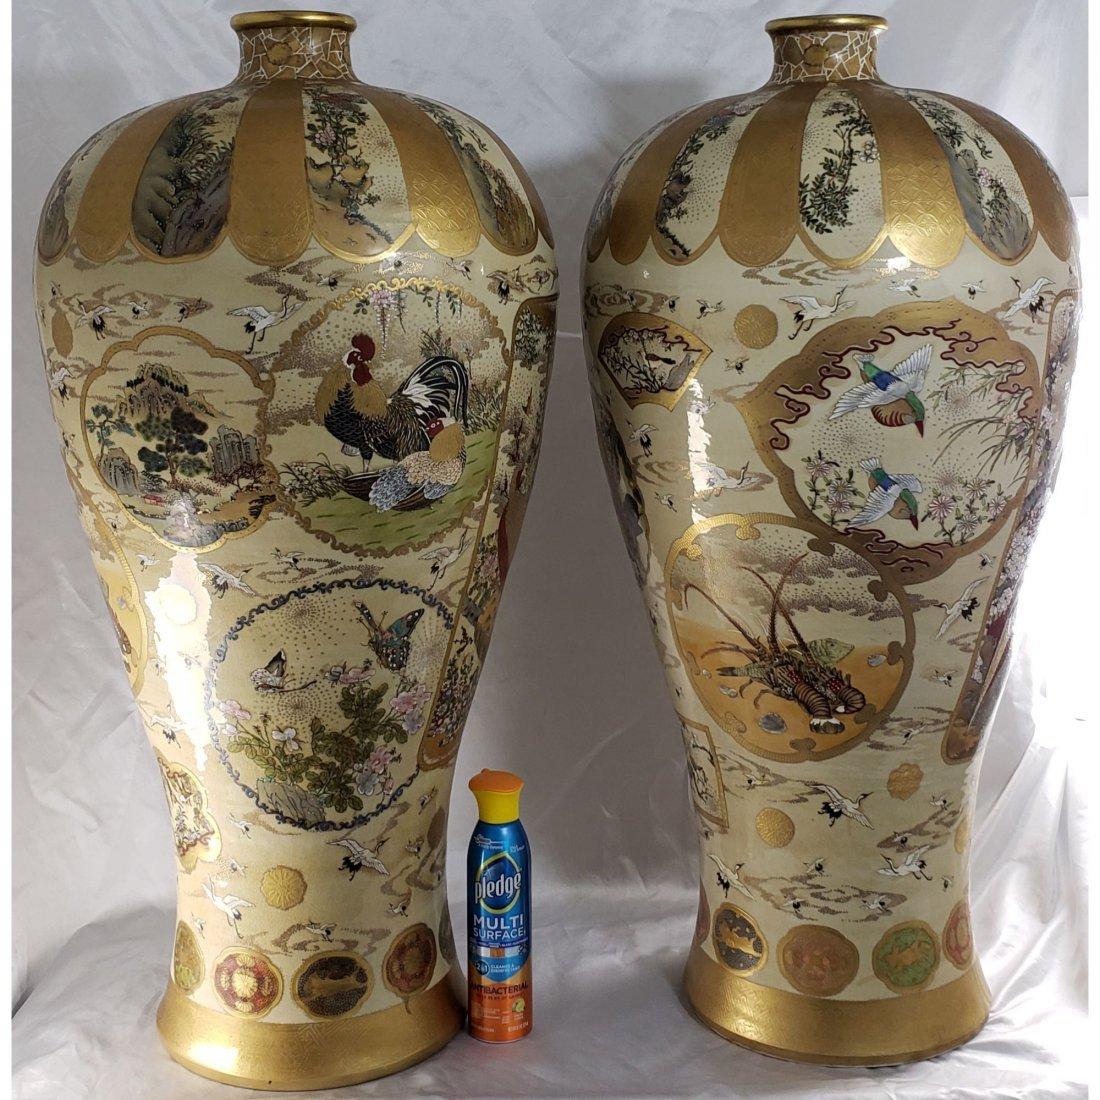 "Pr Of Rare Signed Monumental Satsuma Vase 19 c 36"" Tall"